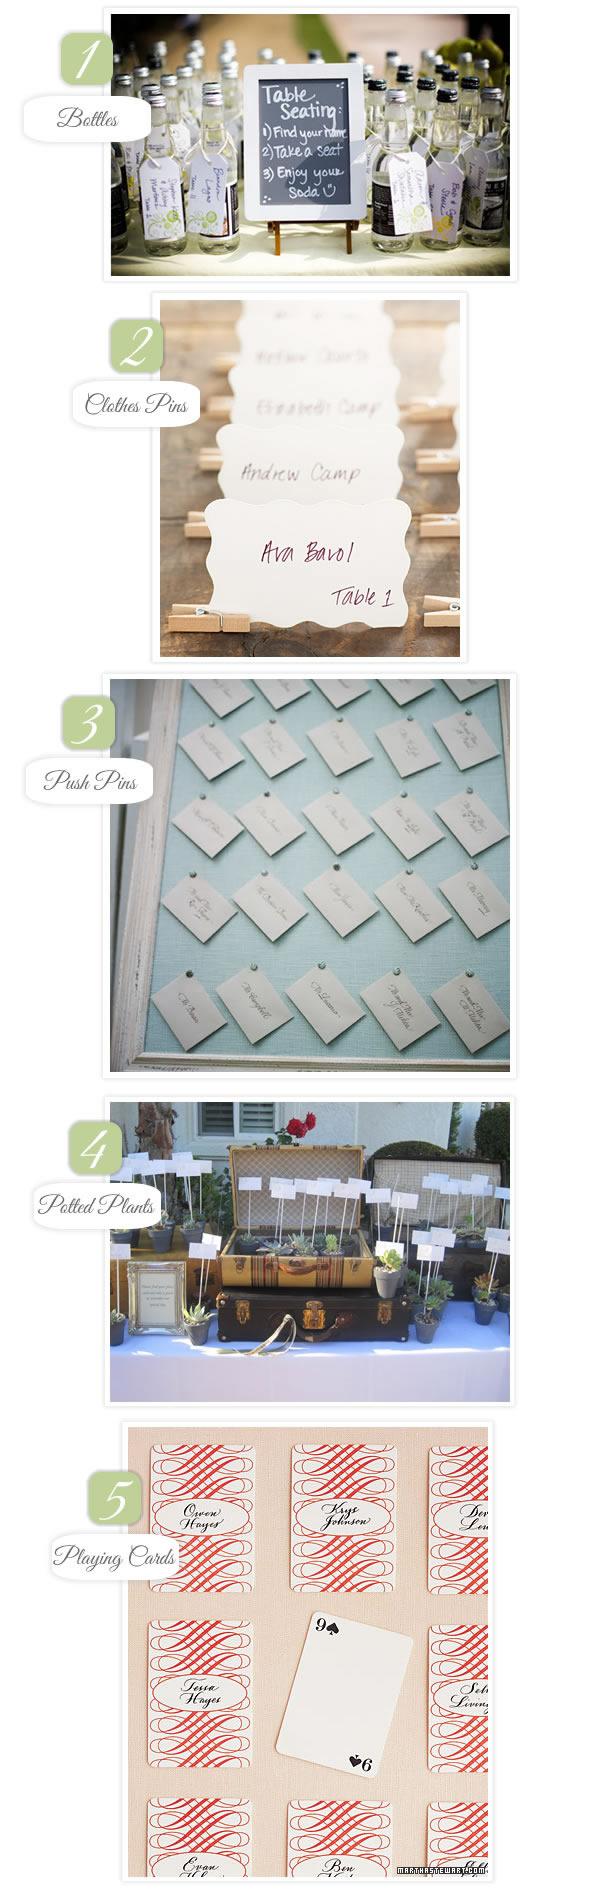 Five Fabulous Place Card Ideas   WeddingWire: The Blog   Rustic ...